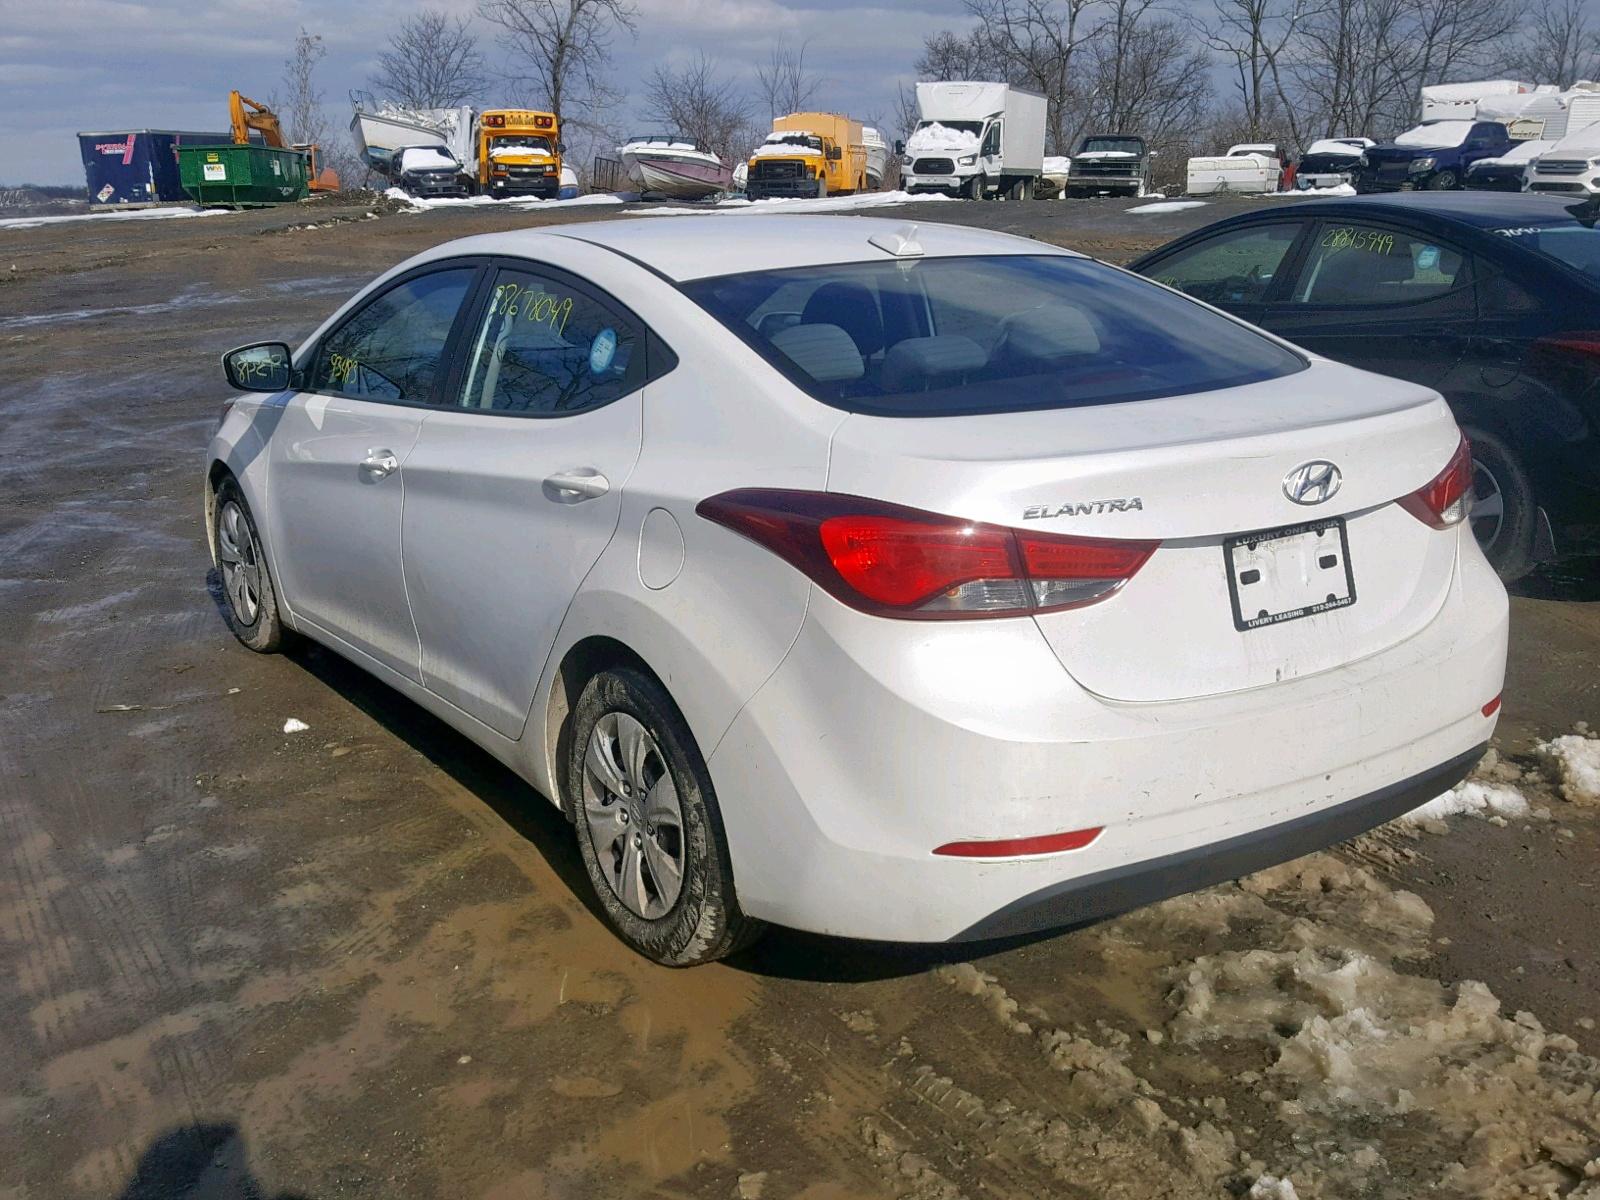 5NPDH4AE1GH704748 - 2016 Hyundai Elantra Se 1.8L [Angle] View